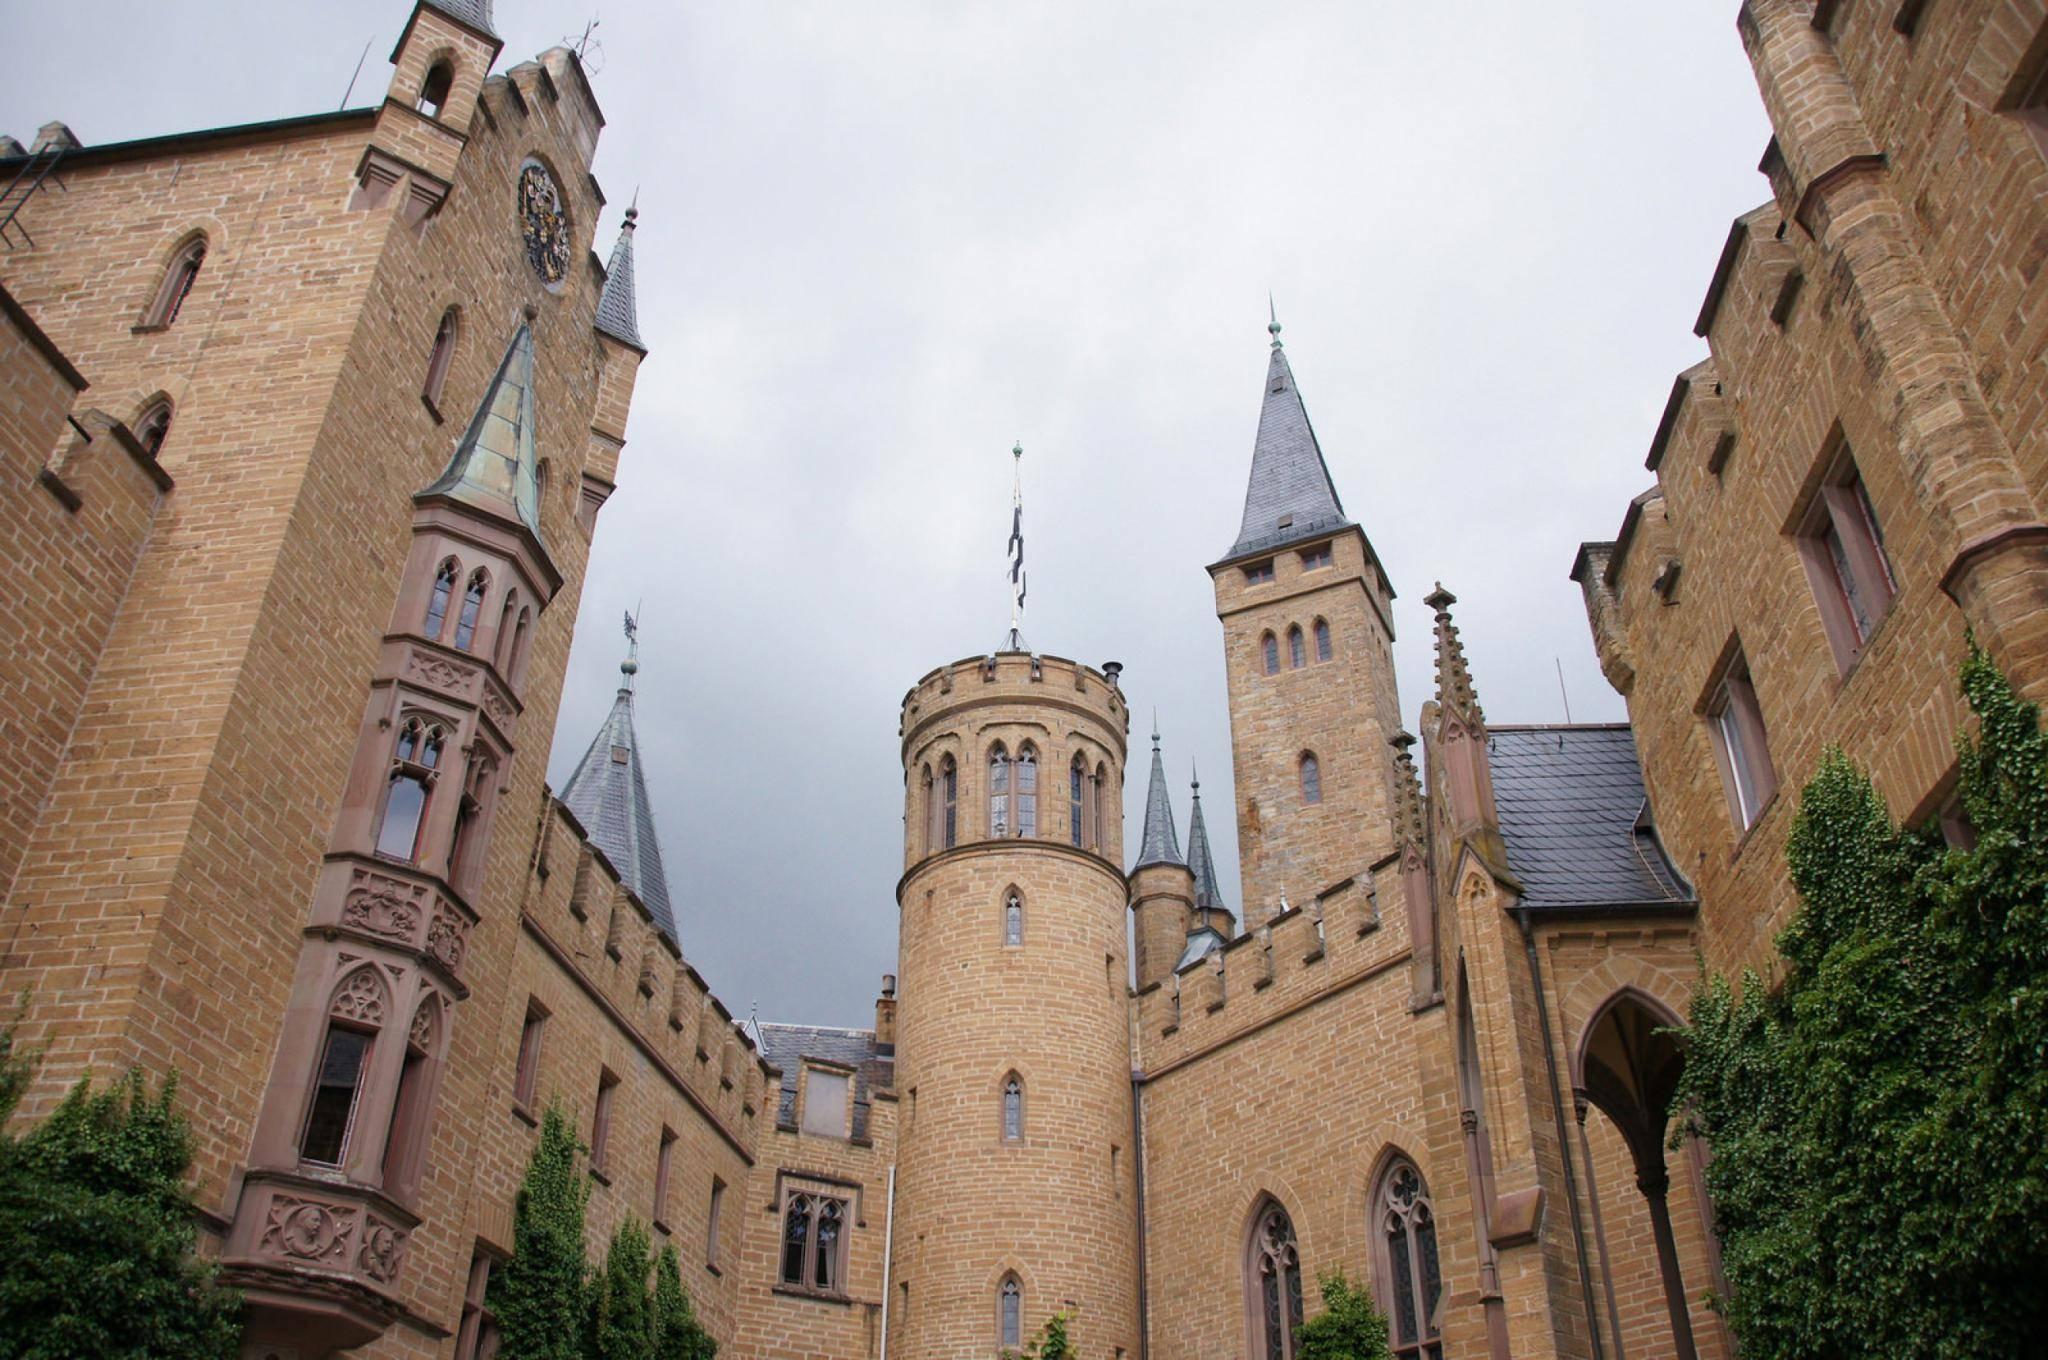 Замок гогенцоллерн (burg hohenzollern) - замки германии